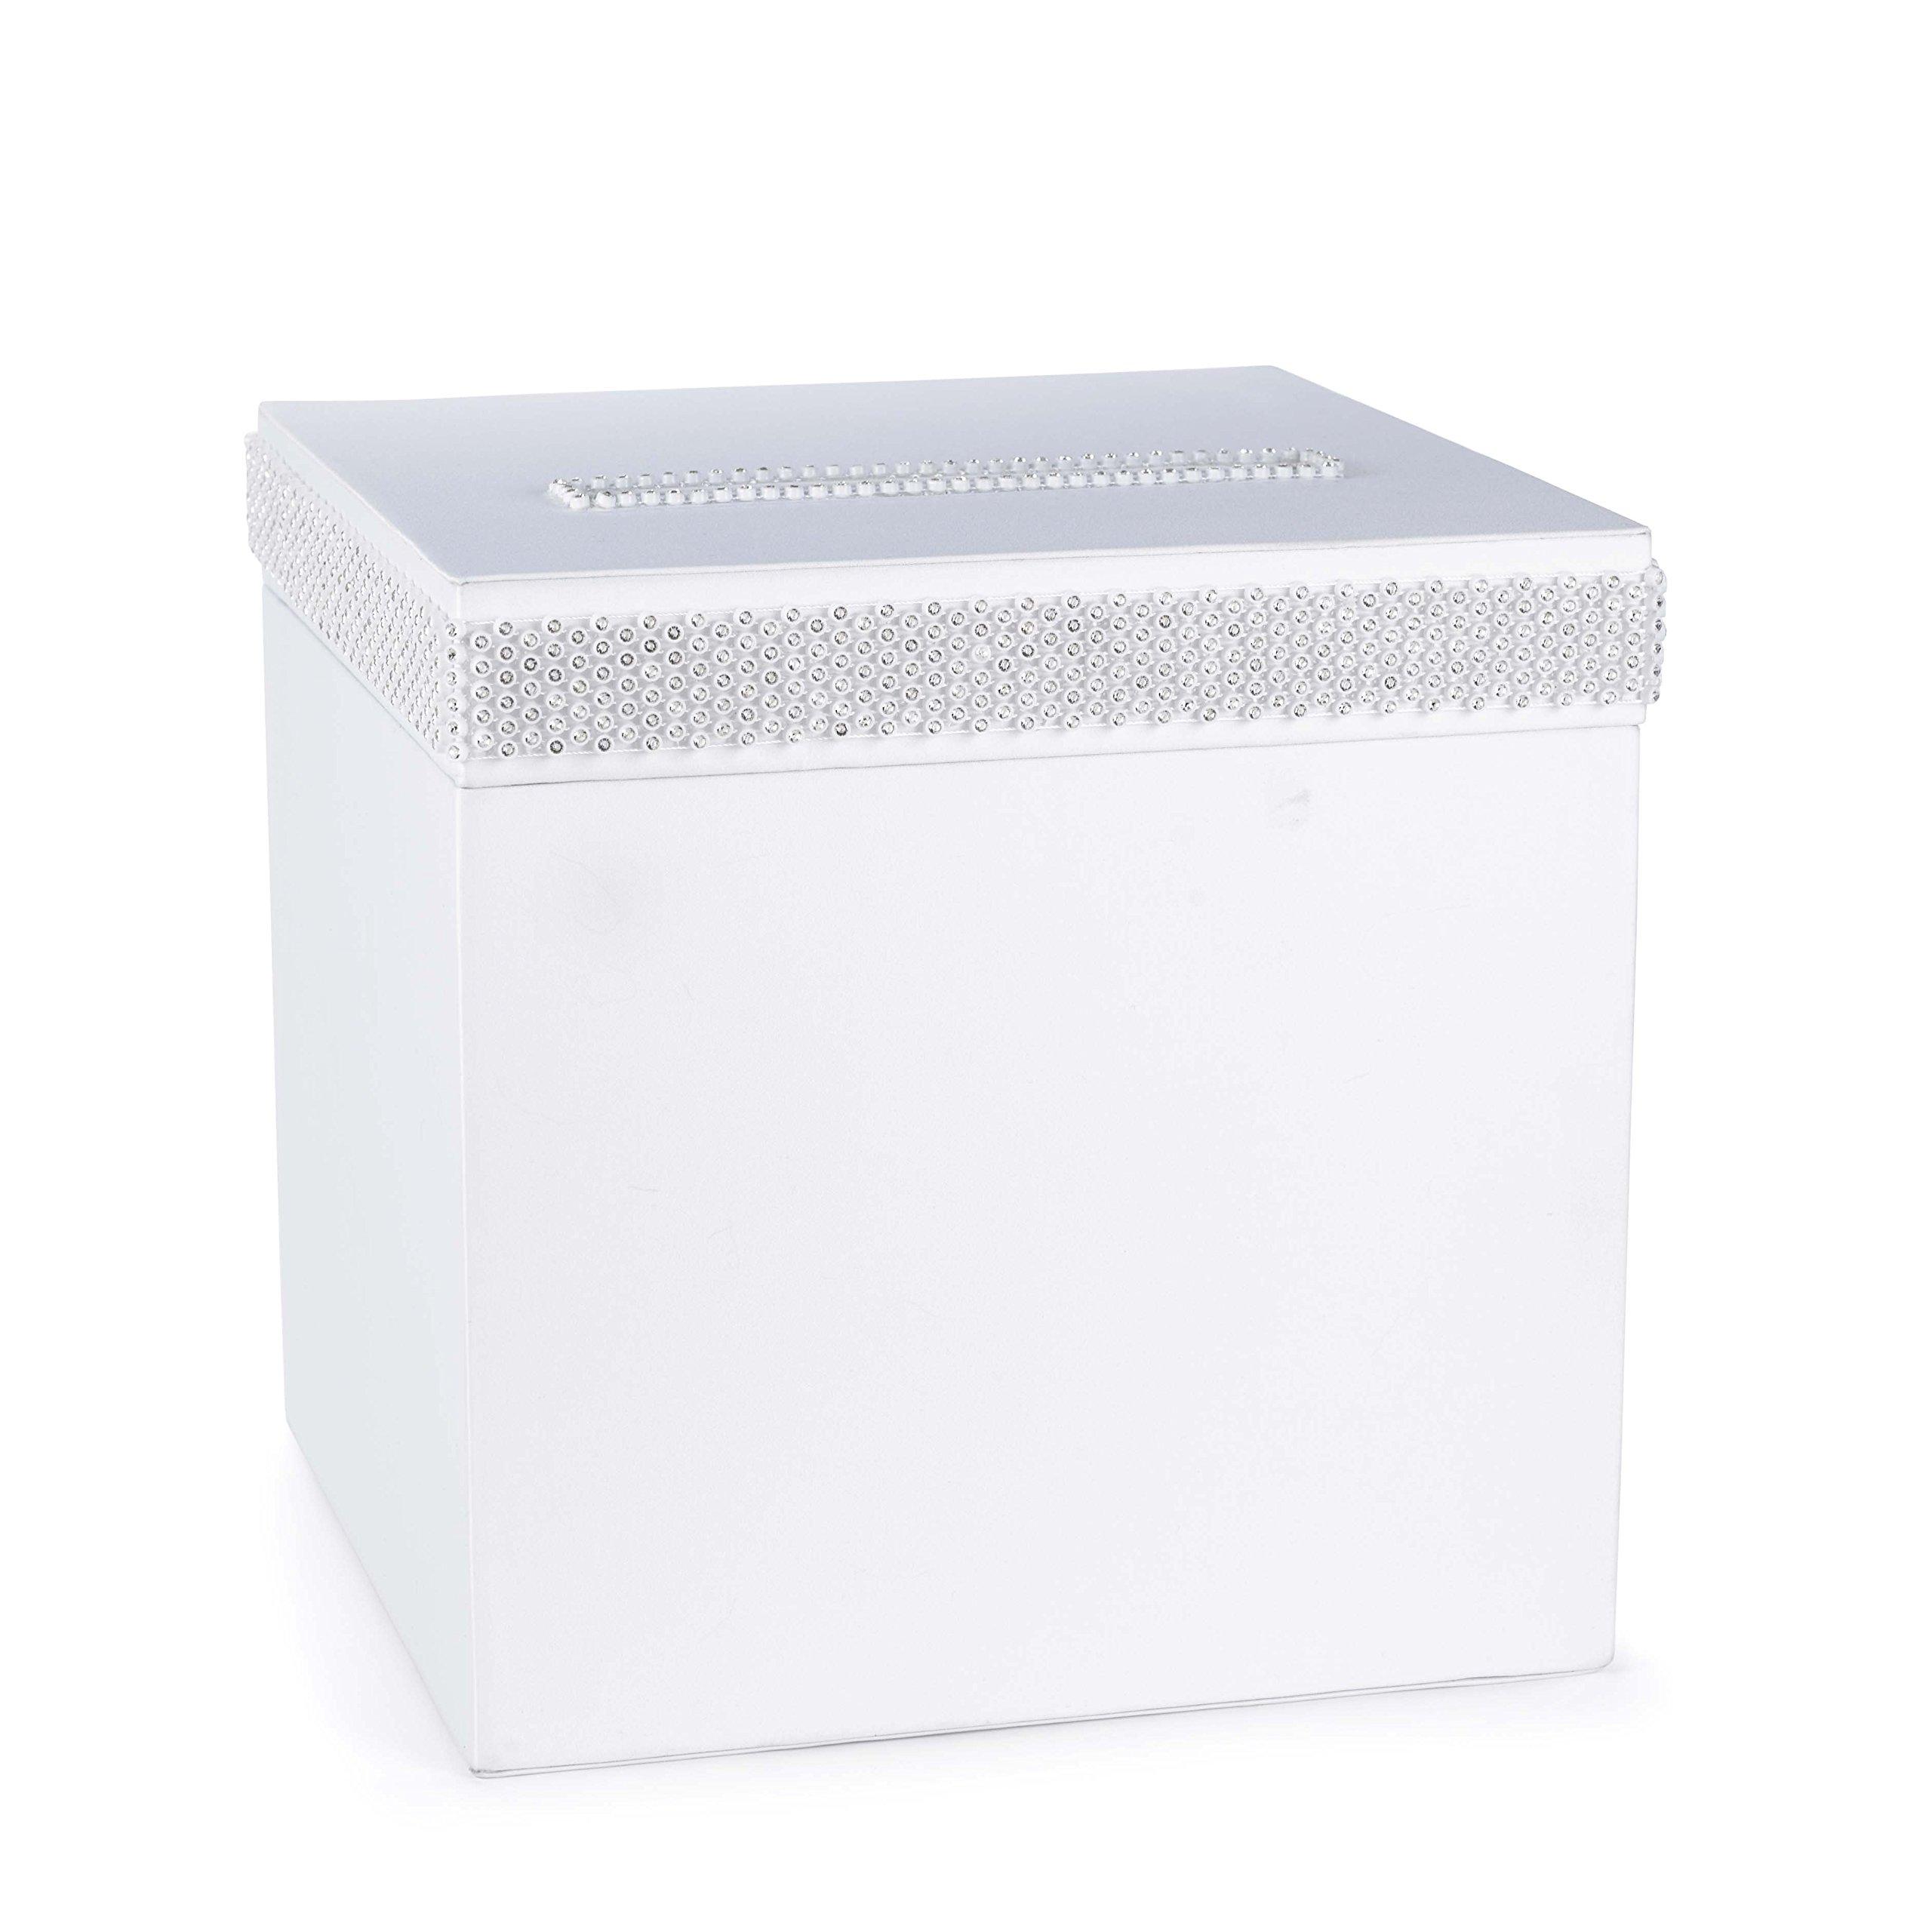 Amazon Wedding Gift Ideas: Wedding Gift Card Boxes For Reception: Amazon.com